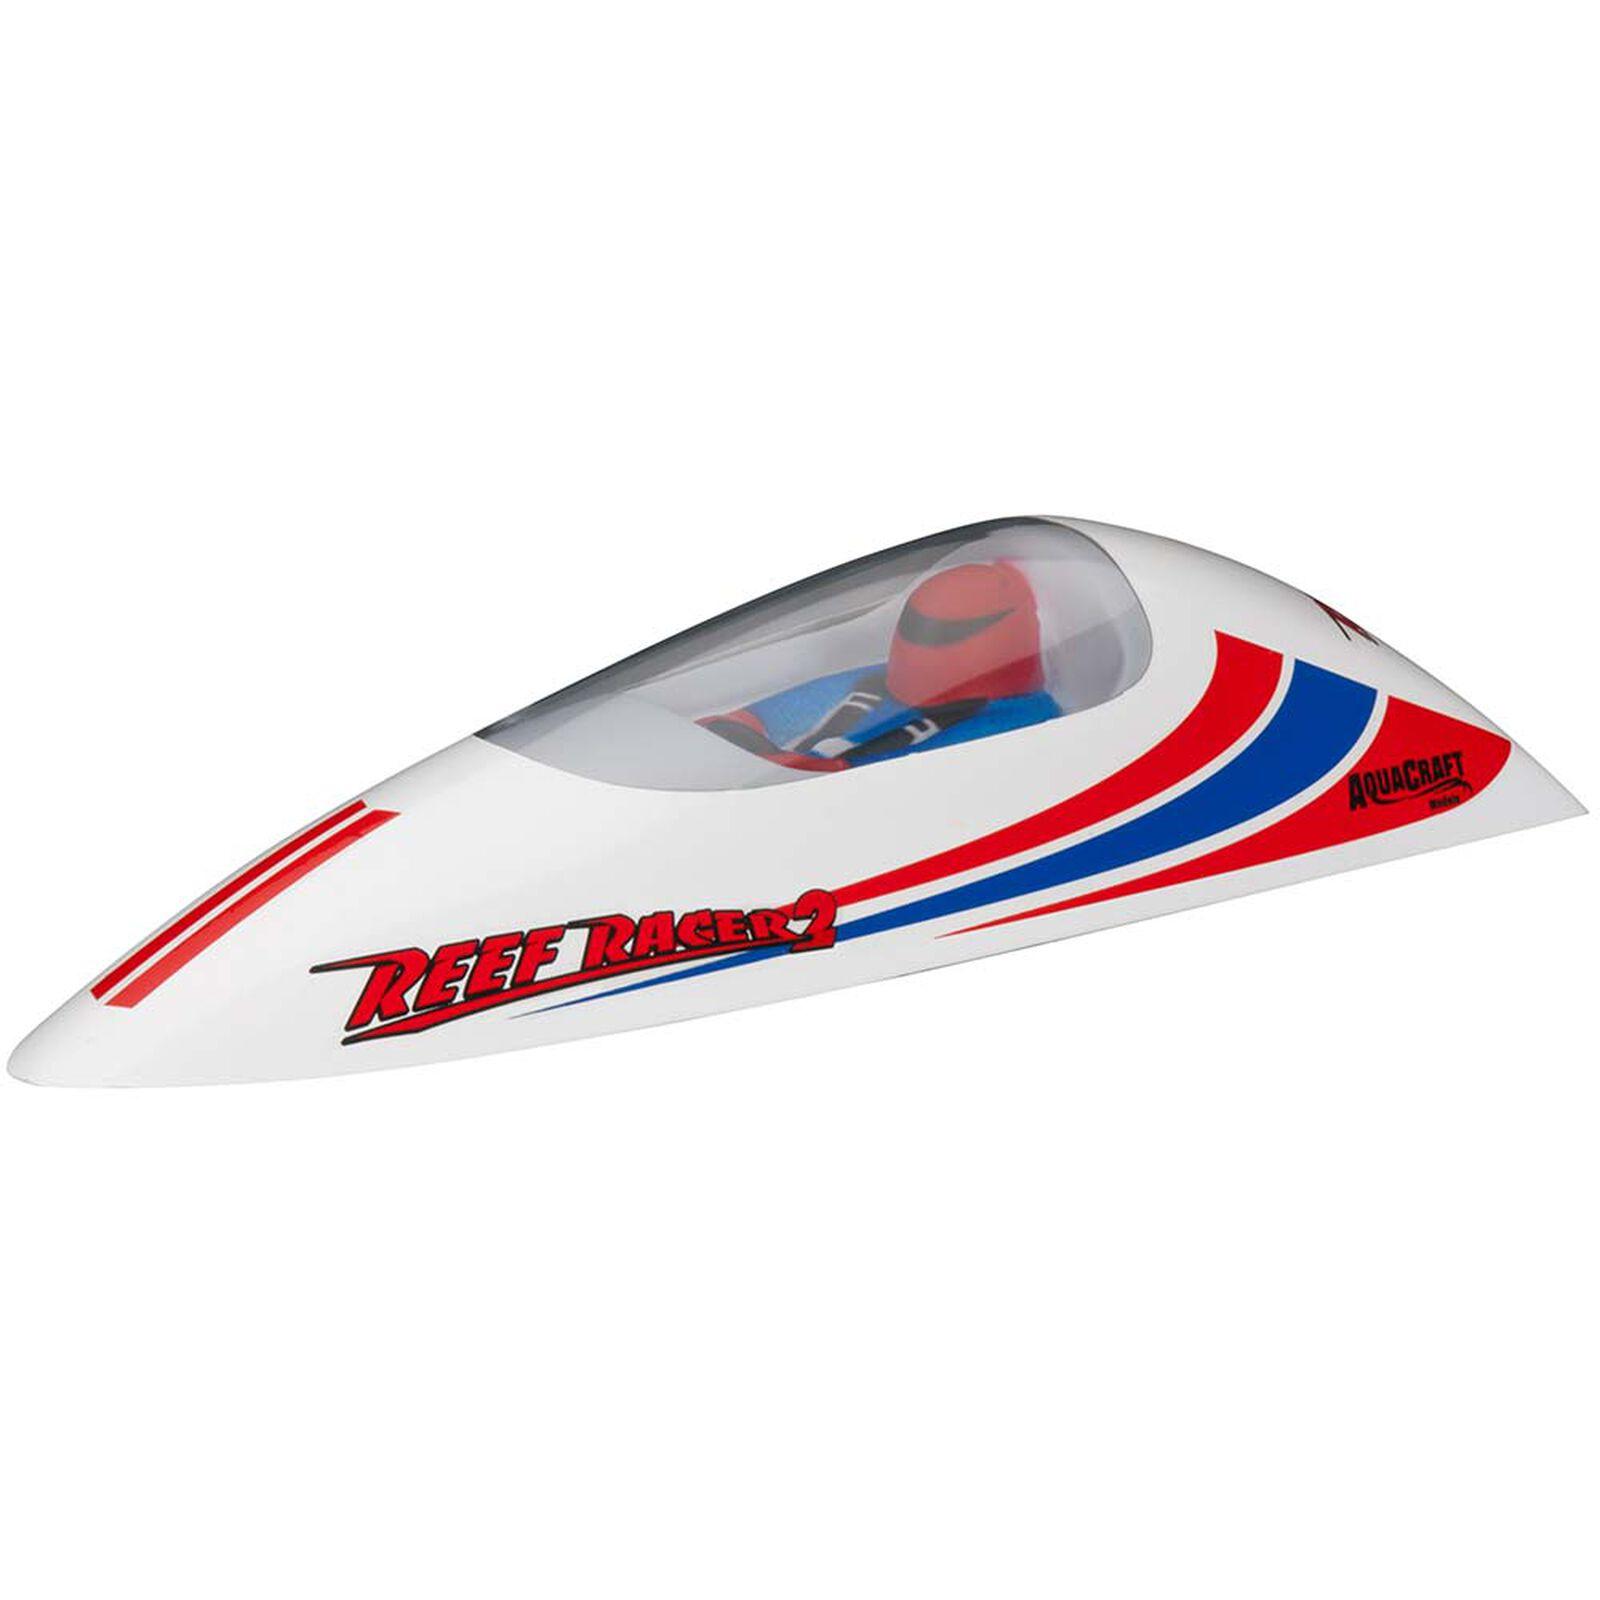 Hatch, White: Reef Racer 2